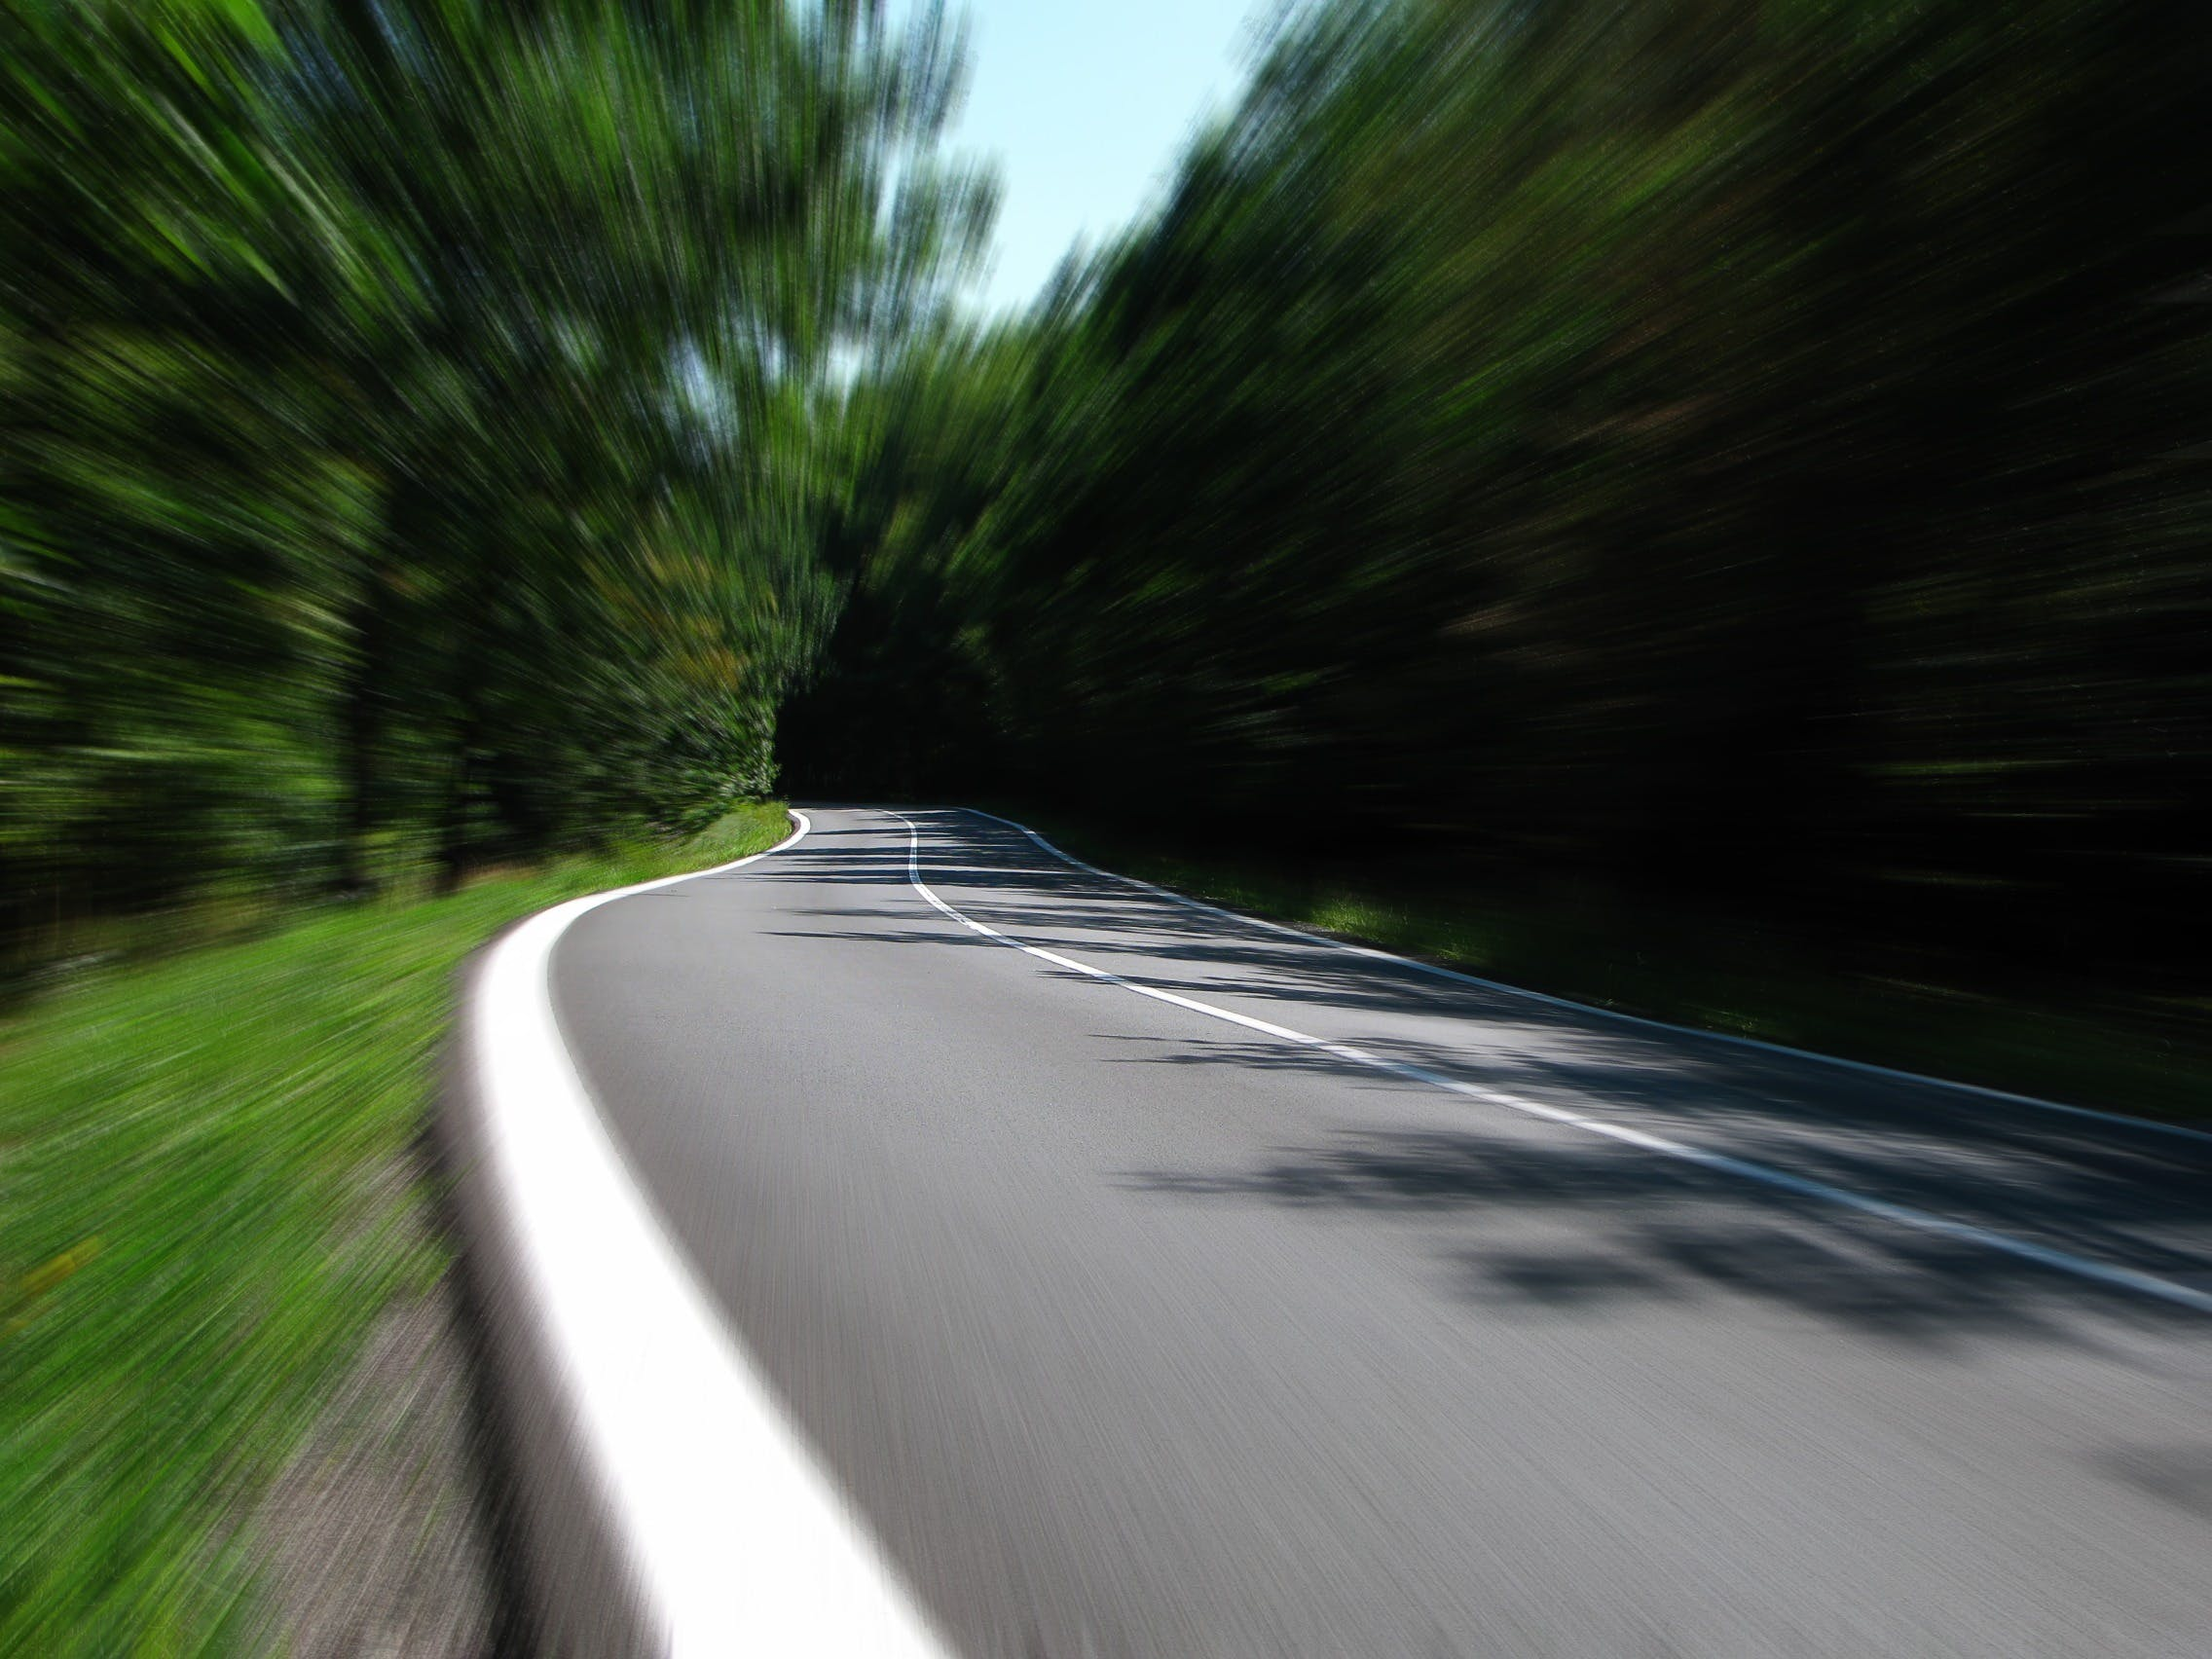 Grey Asphalt Road · Free Stock Photo